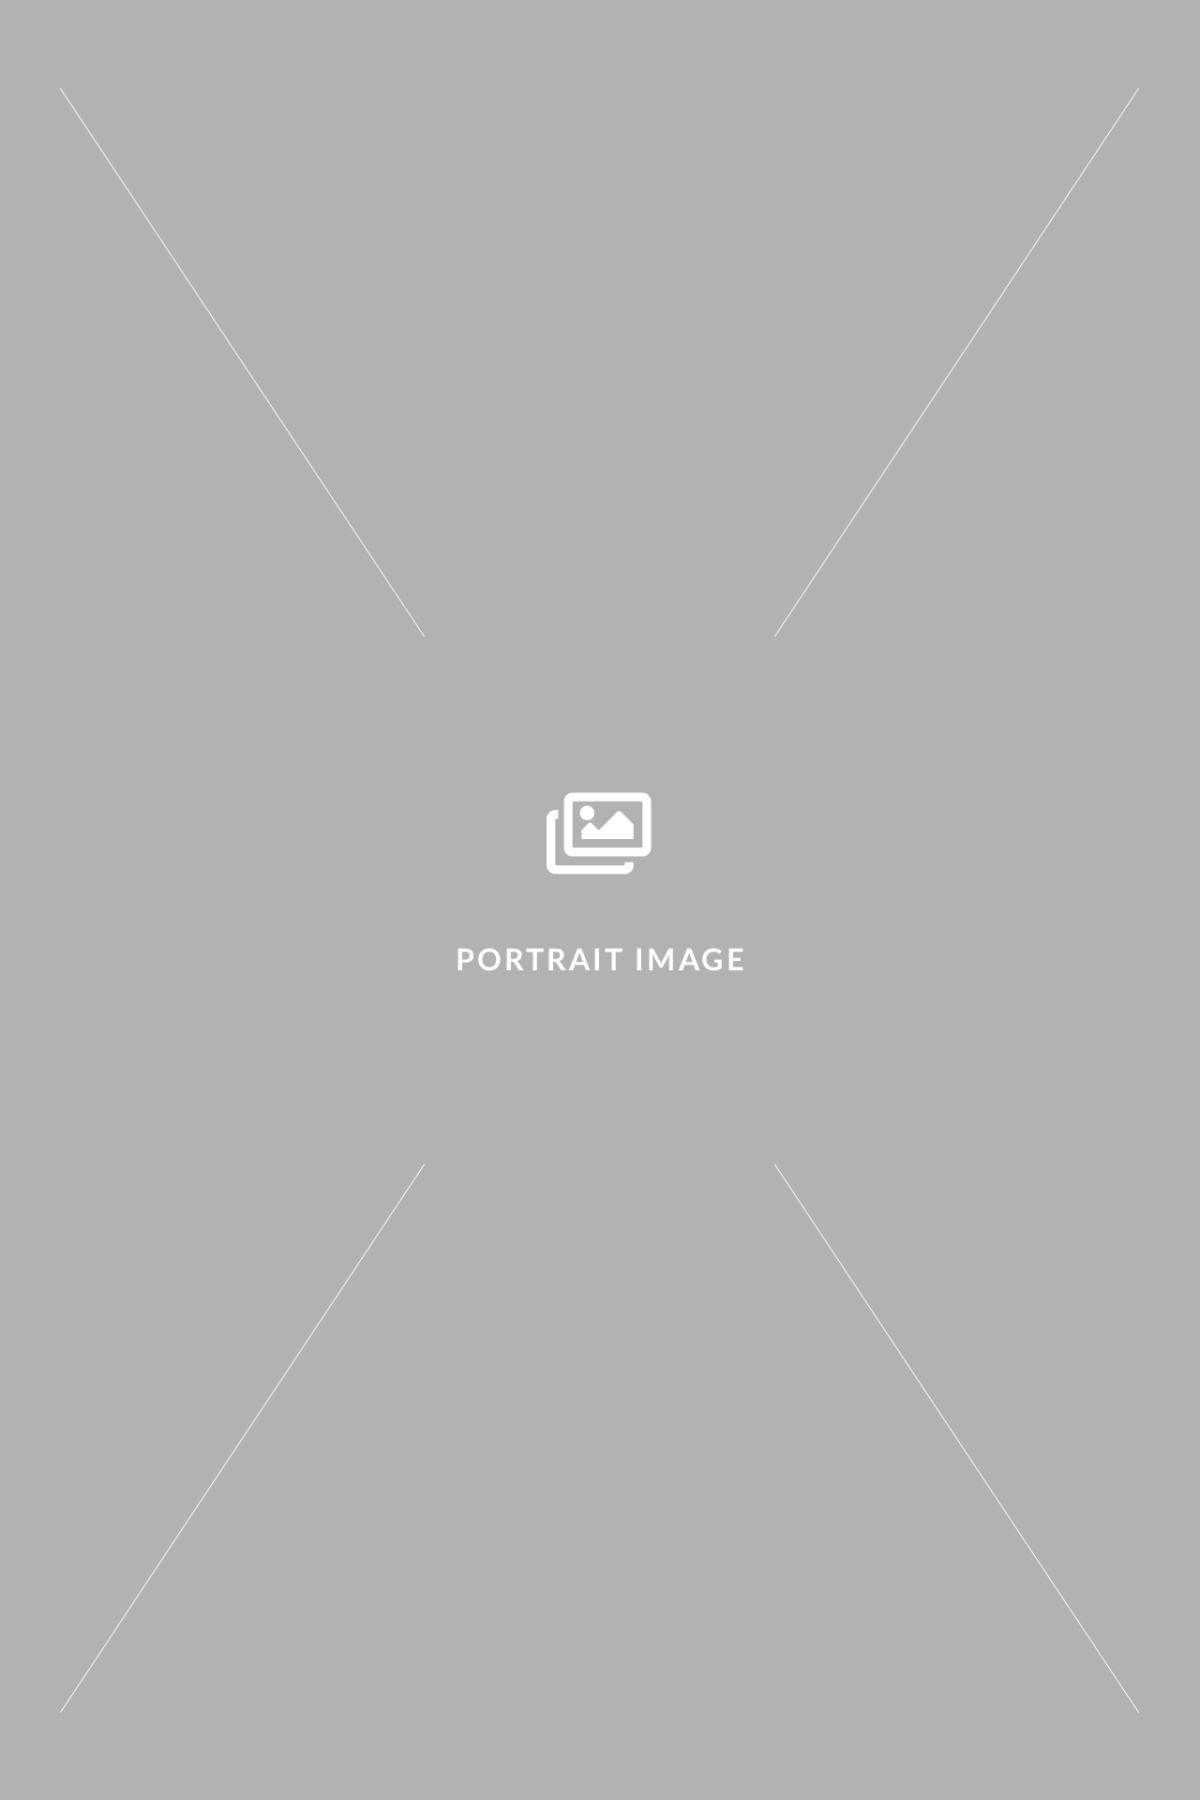 img-placeholder-portrait